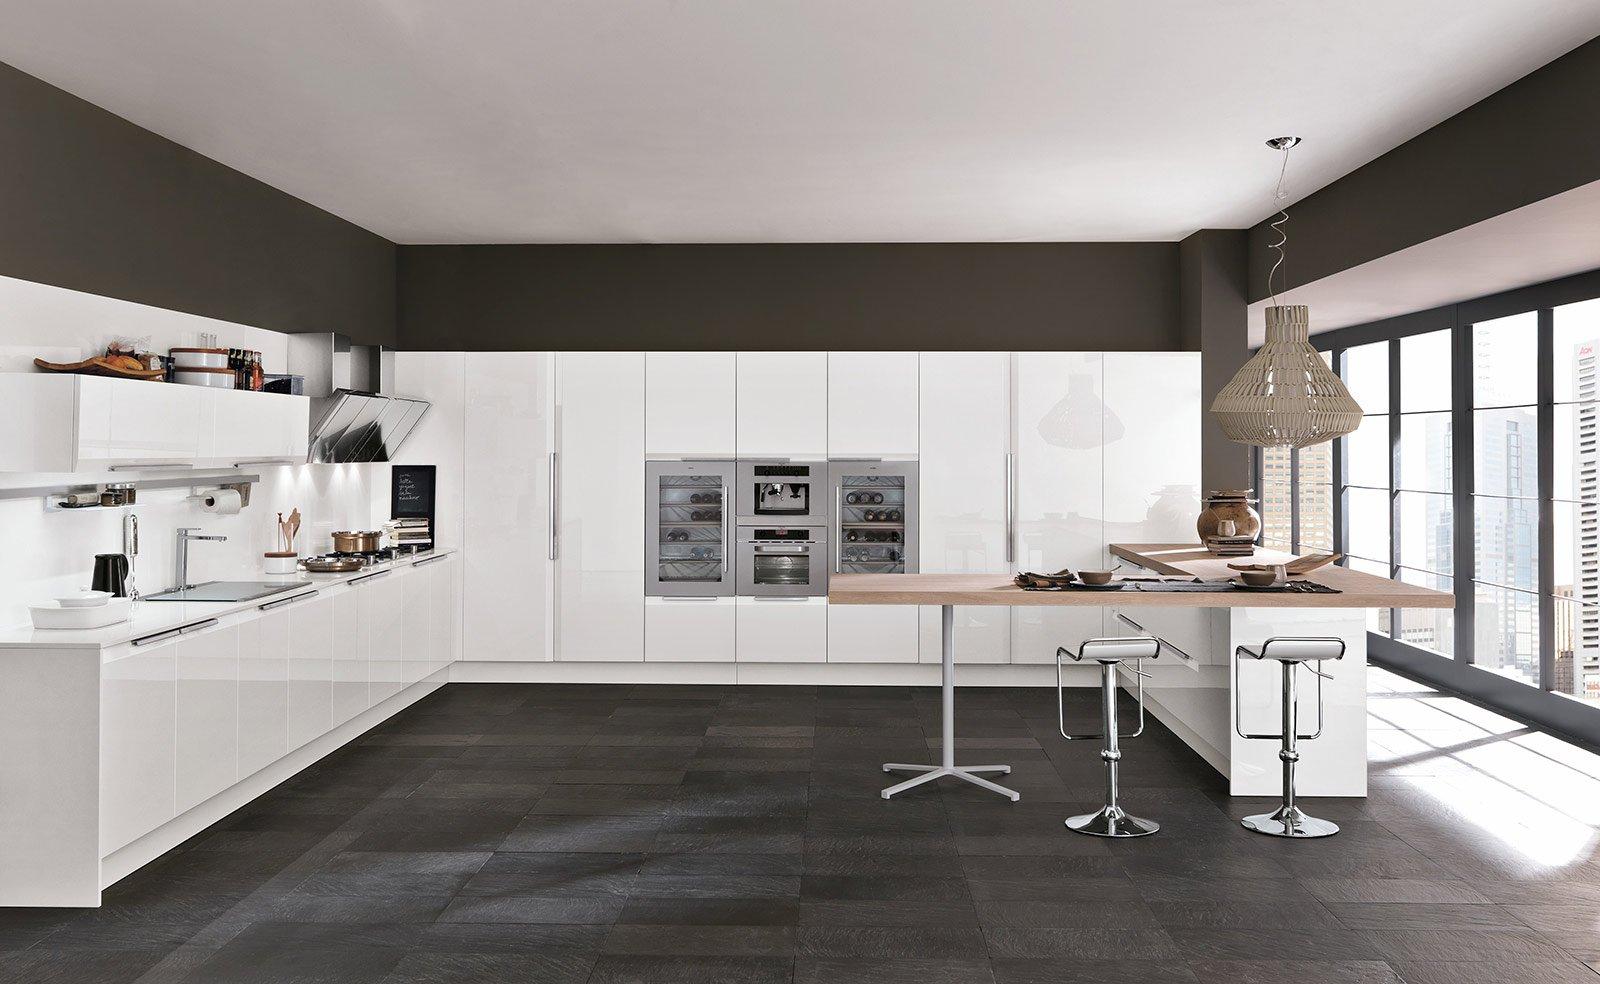 Cucine bianche moderne cose di casa for Dispensa cucina mercatone uno